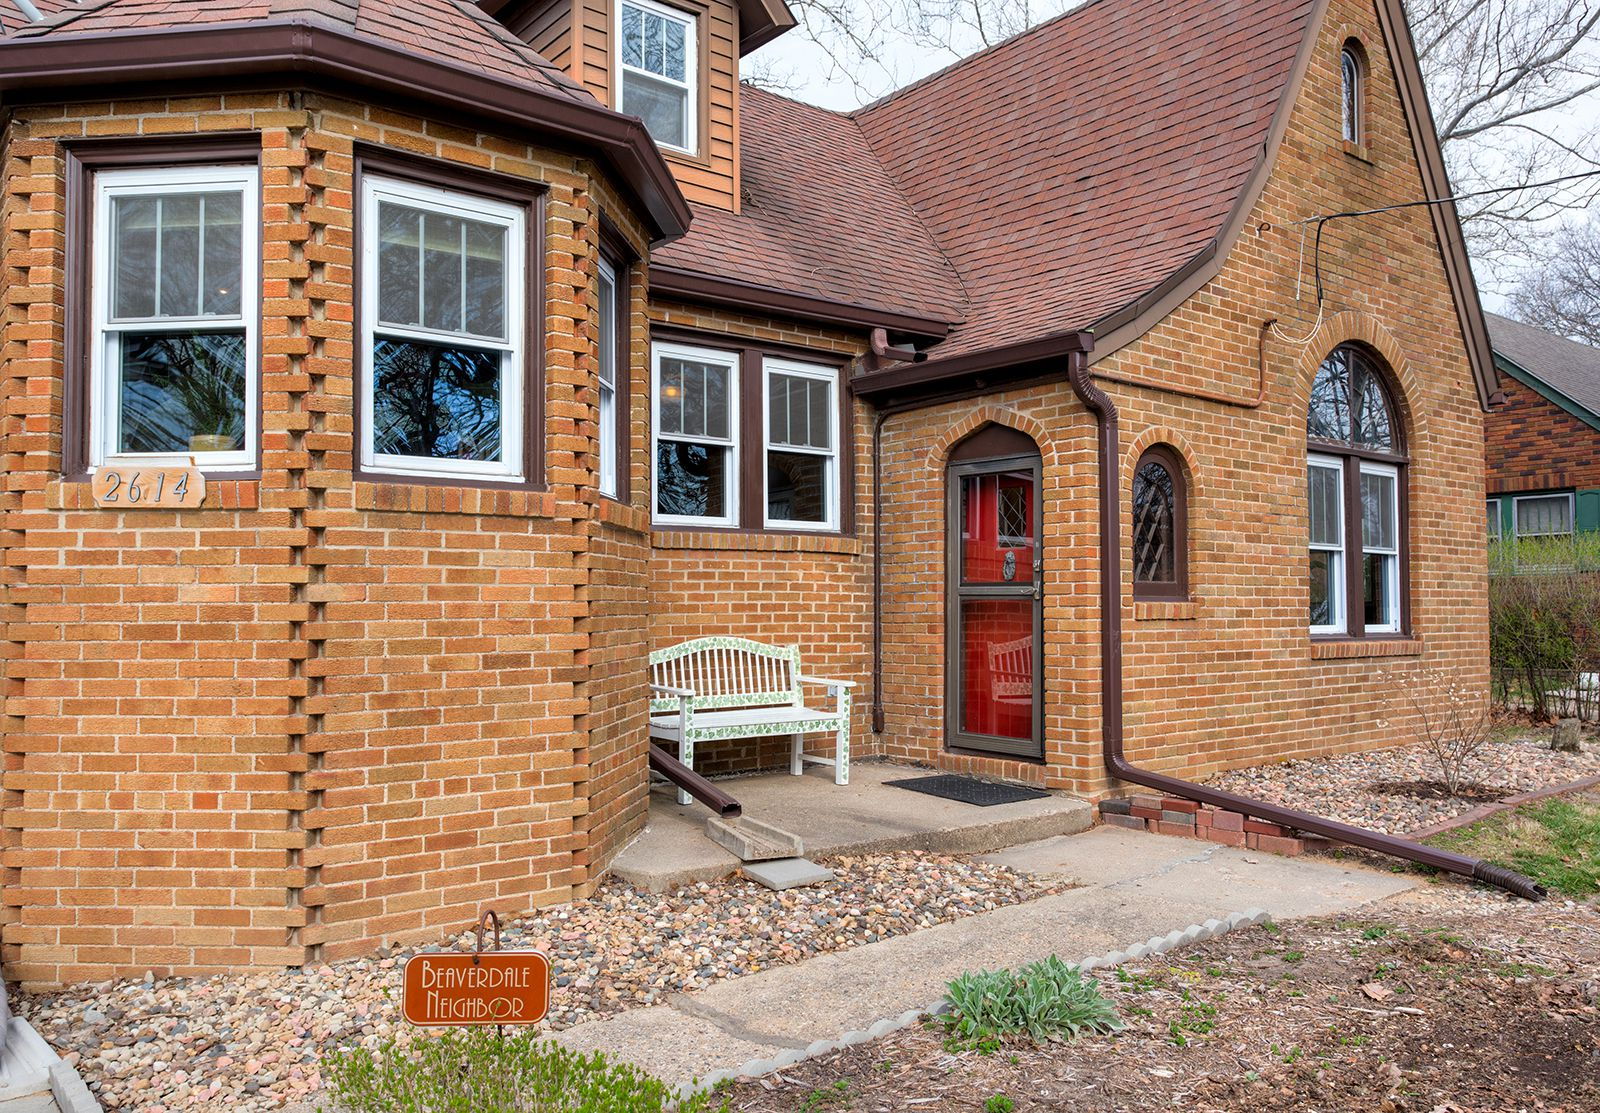 A Beaverdale cottage brick home